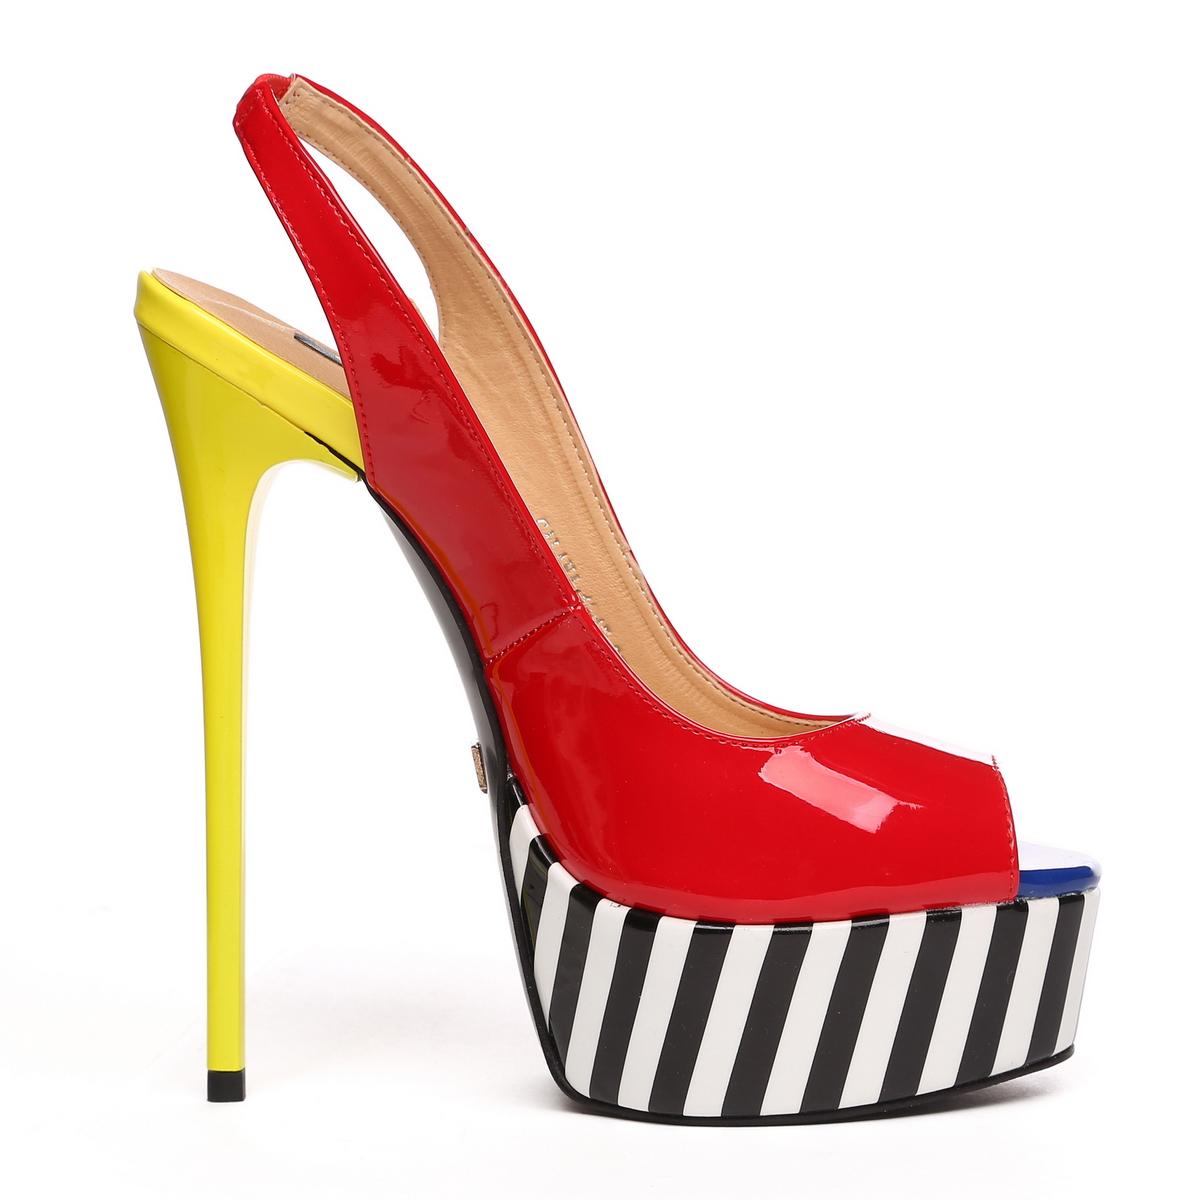 GIARO - Damen Plateau High Heel Pumps - Lack Merfarbig Schuhe in Übergrößen – Bild 4